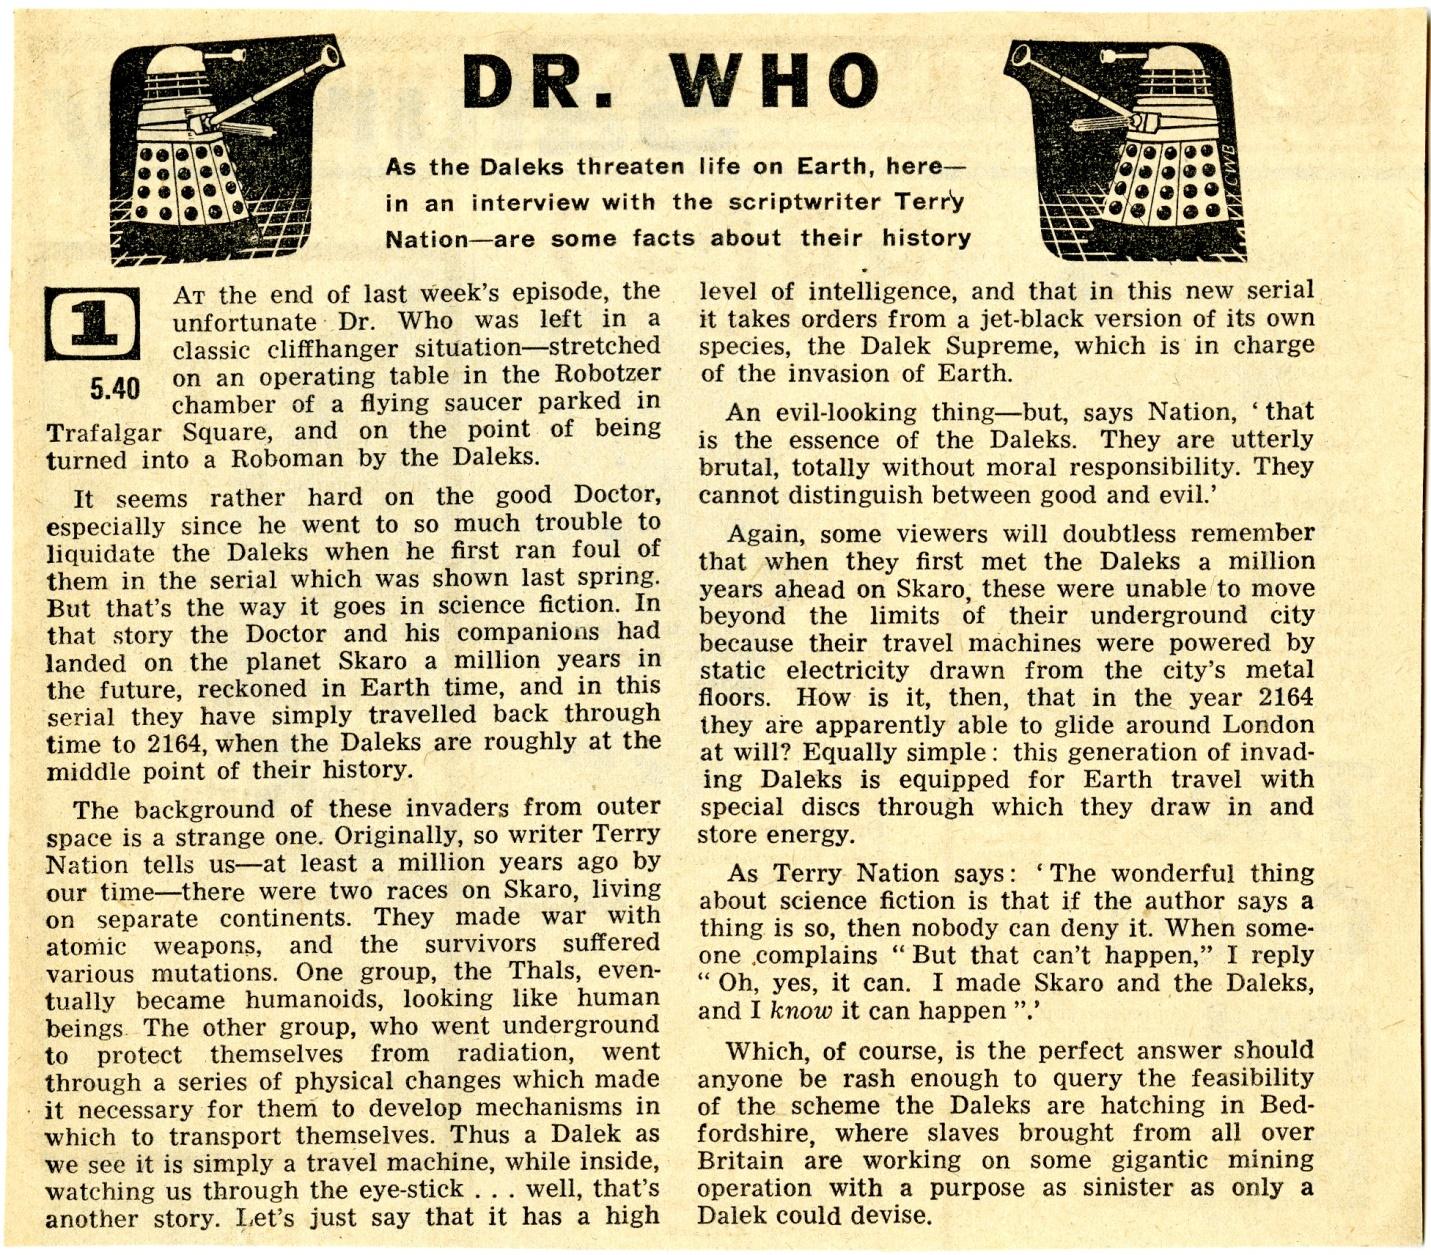 Radio Times, December 5-11, 1964